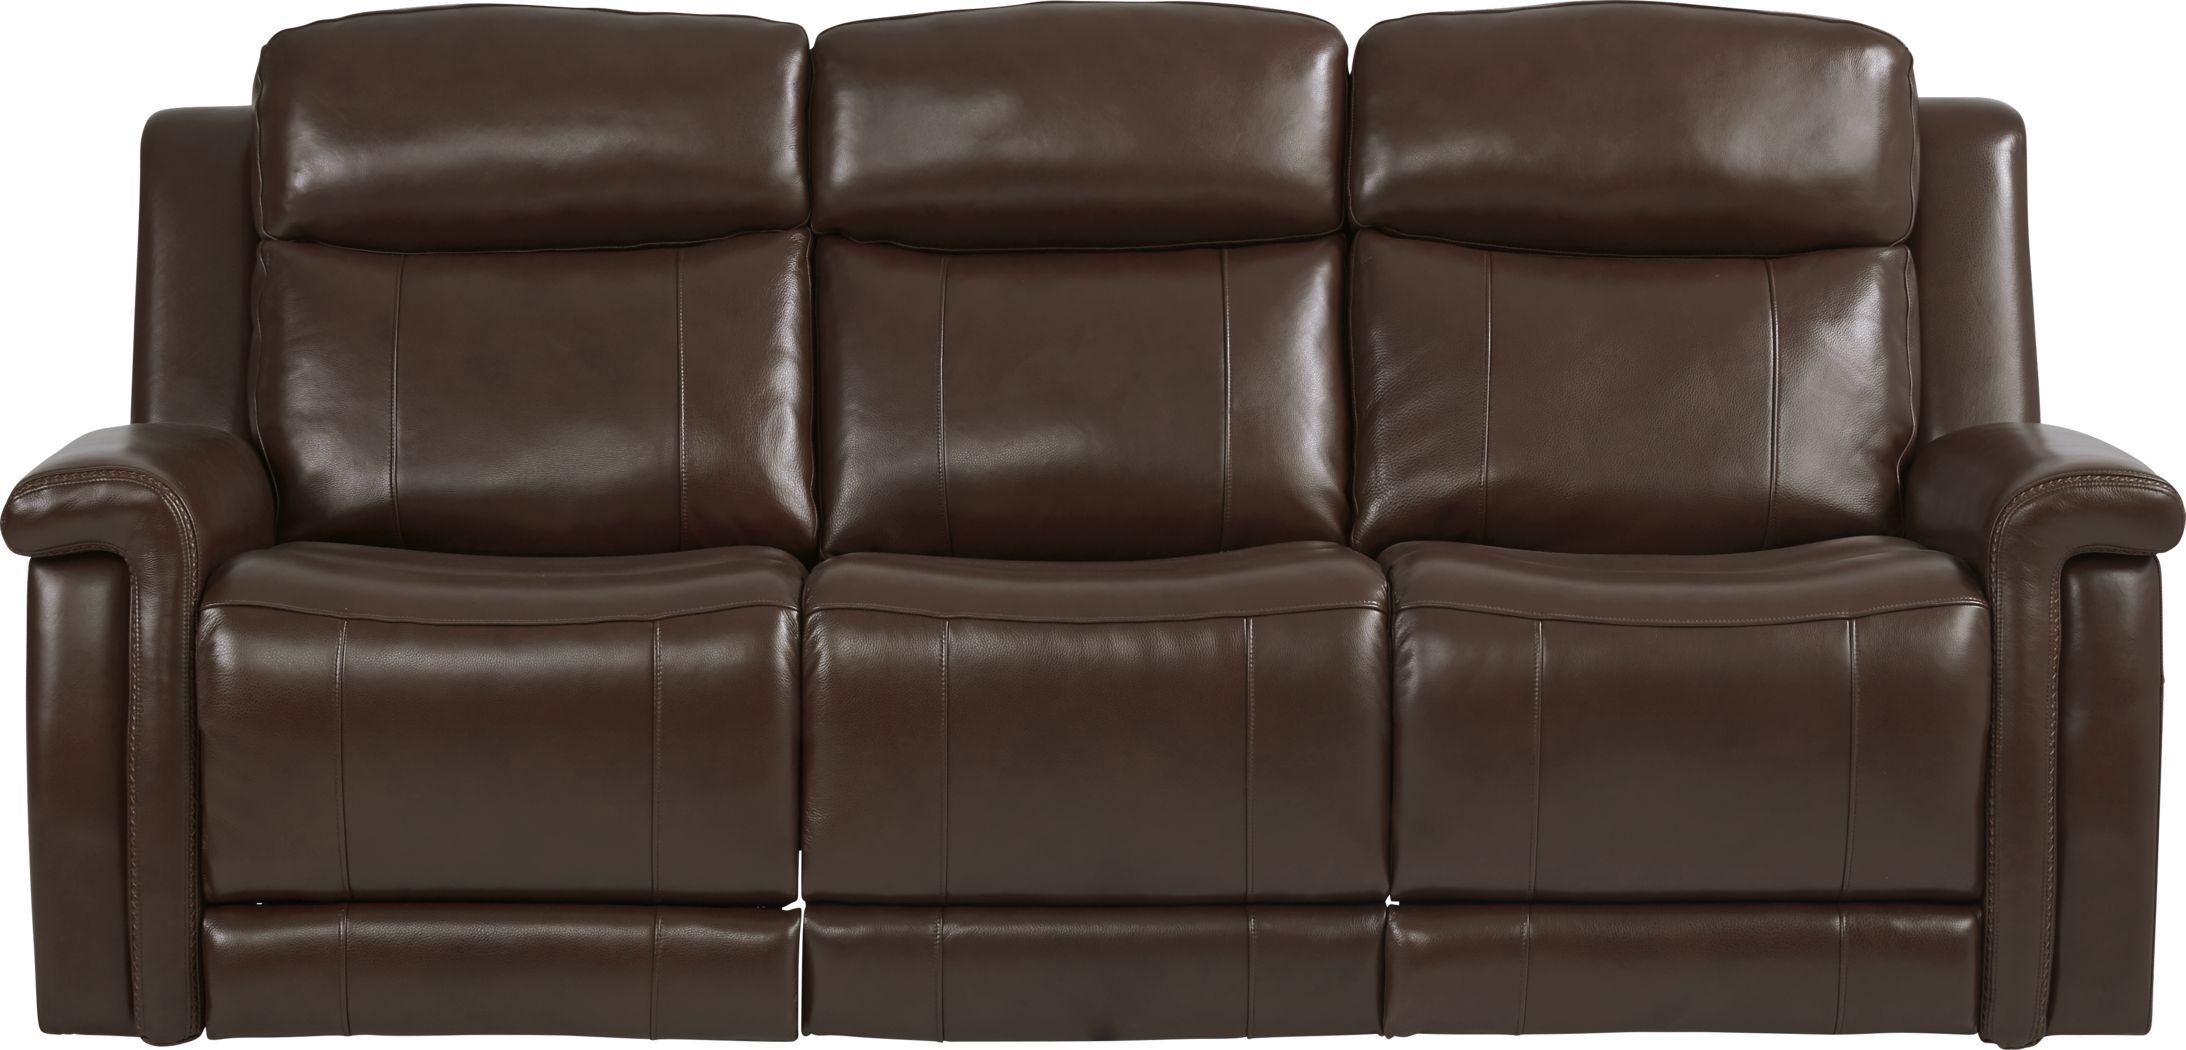 Orsini Brown Leather Dual Power Reclining Sofa